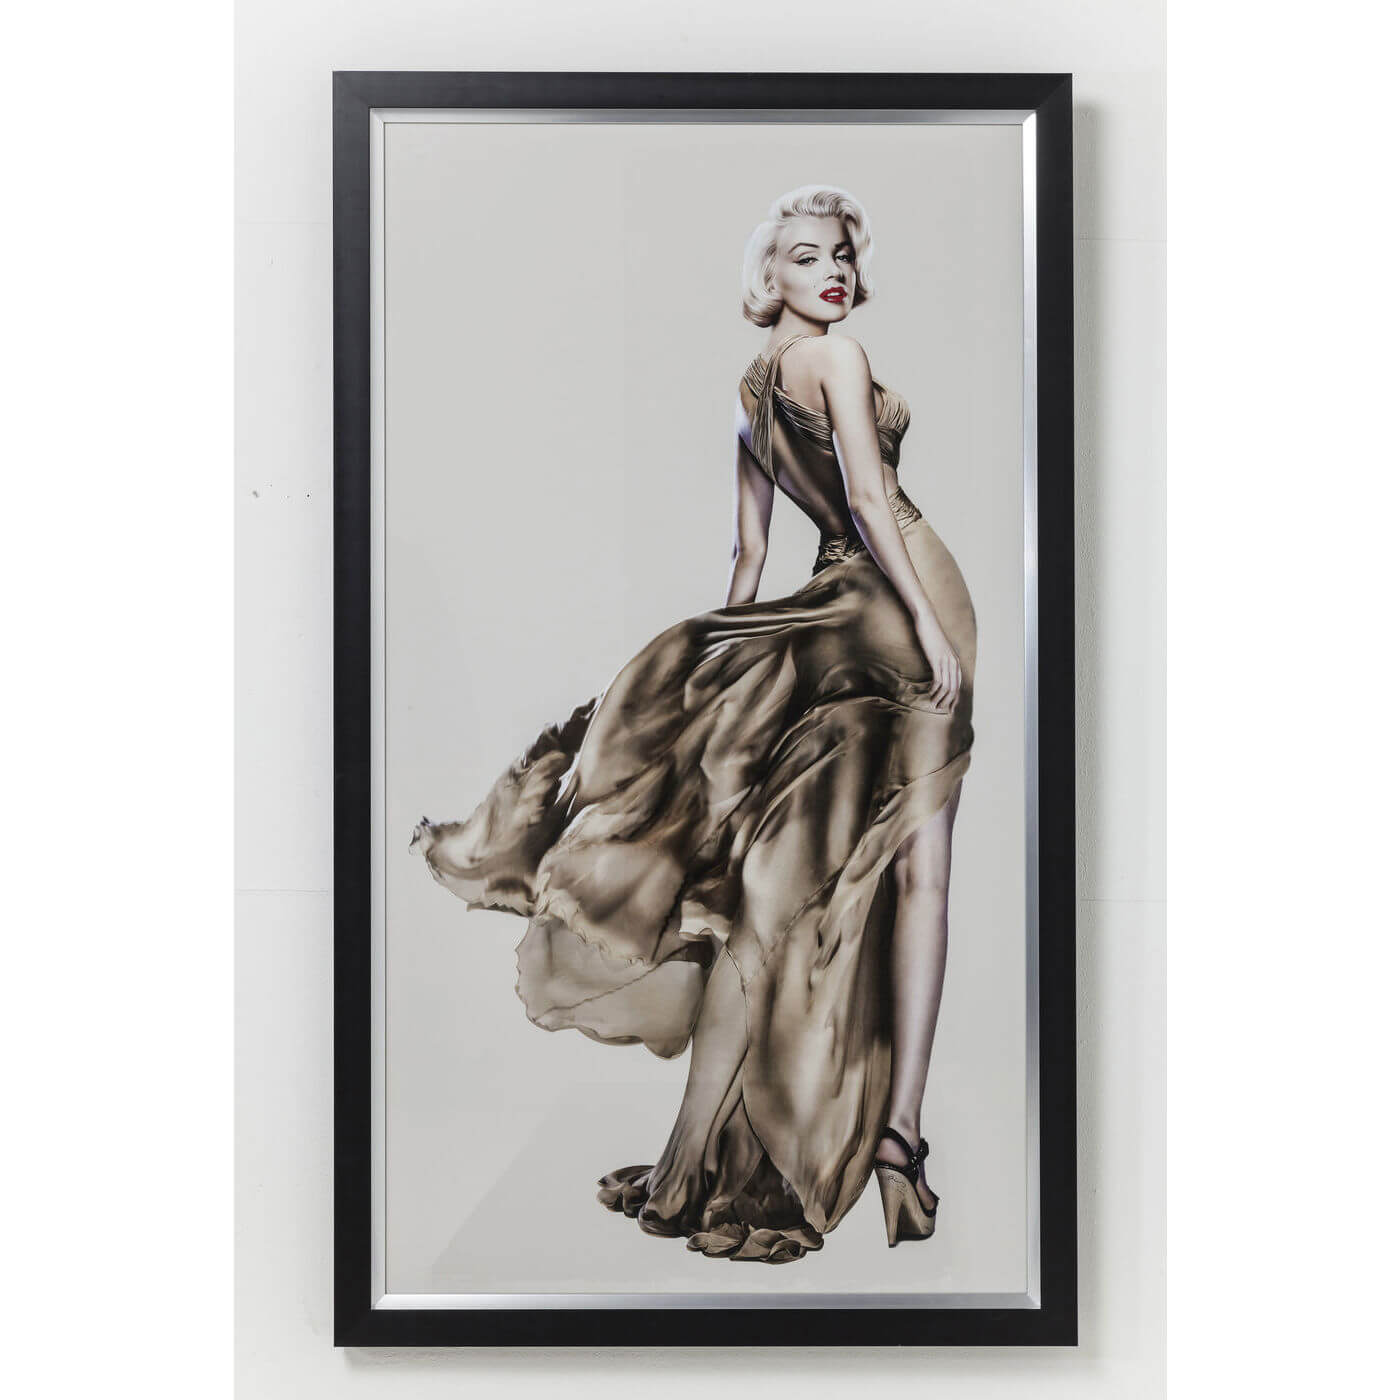 kare design – Kare design plakat marilyn - brun/creme/grå, m. ramme, (172x100cm) fra boboonline.dk